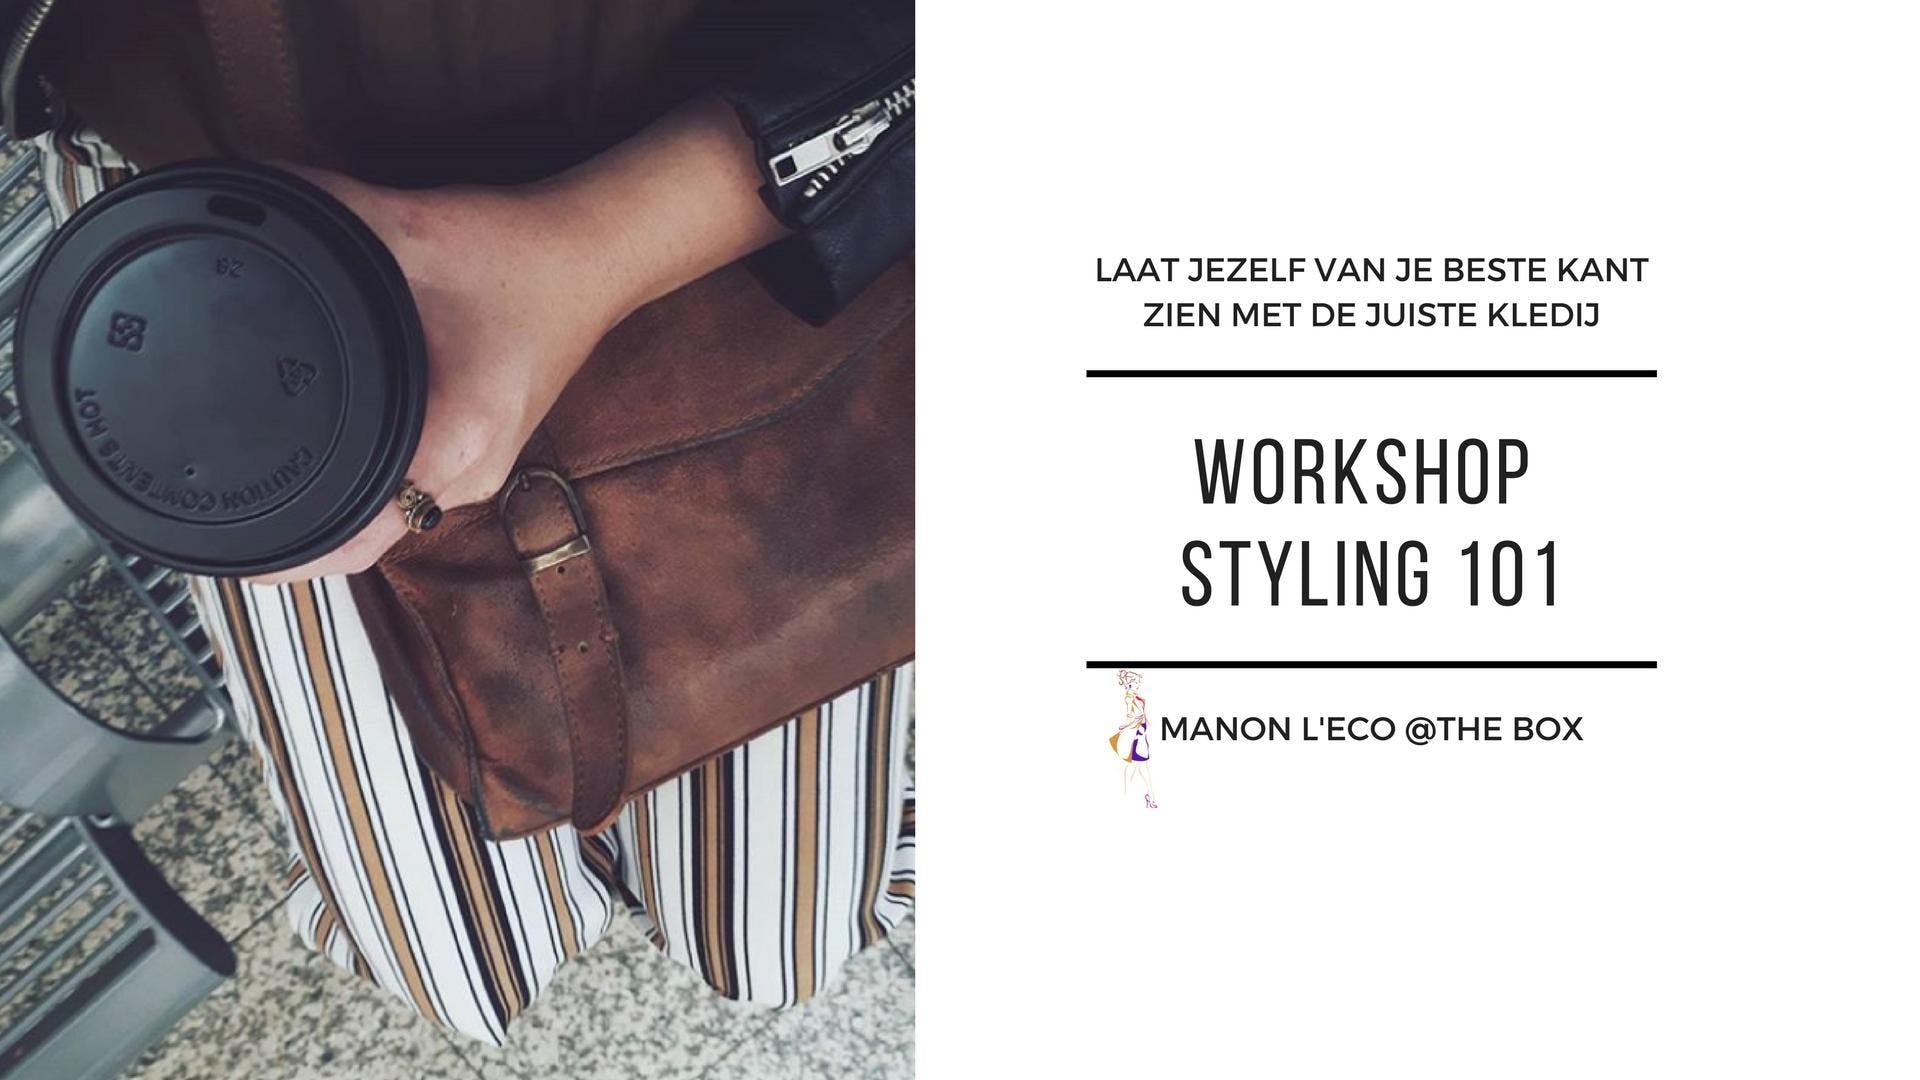 Workshop styling 101